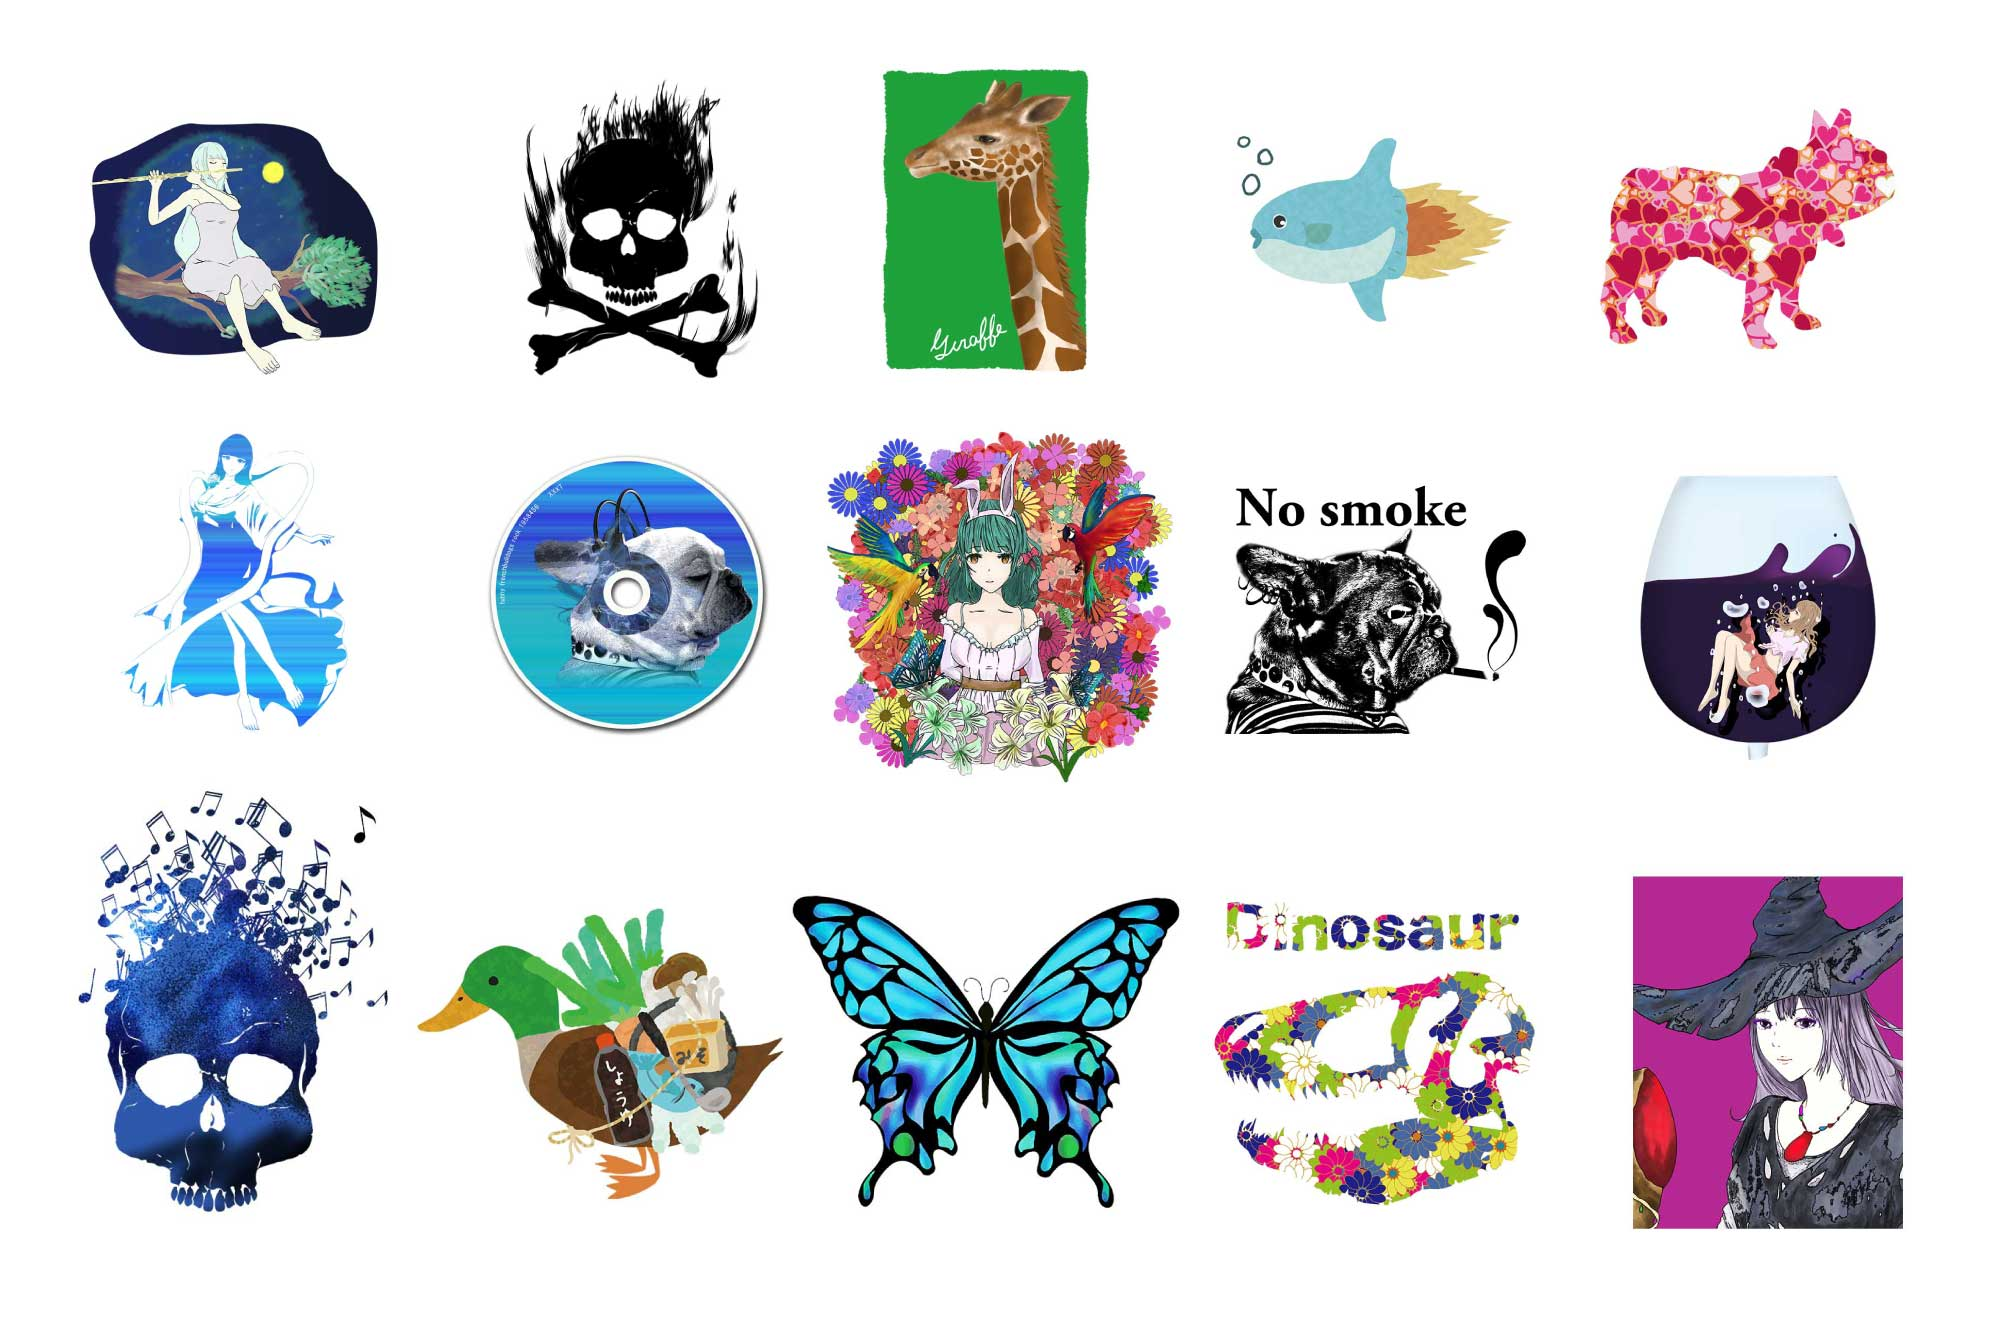 foolのグッズ系デザインポートフォリオ - 函館から愛を込めて